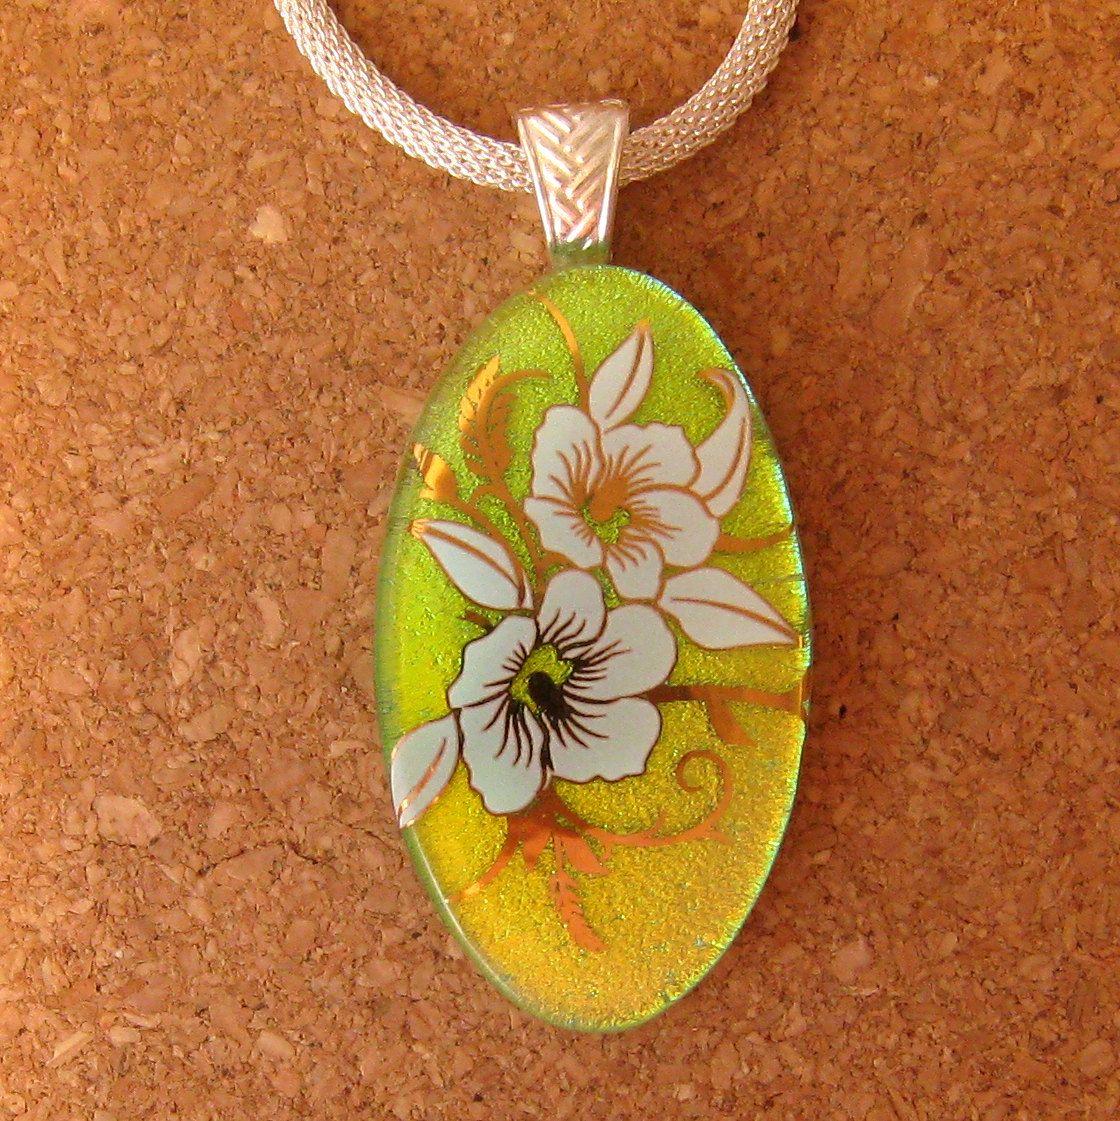 Dichroic Glass Pendant - Fused Glass Pendant - Decal Pendant - Flower Pendant - Dichroic Jewelry by GlassMystique on Etsy